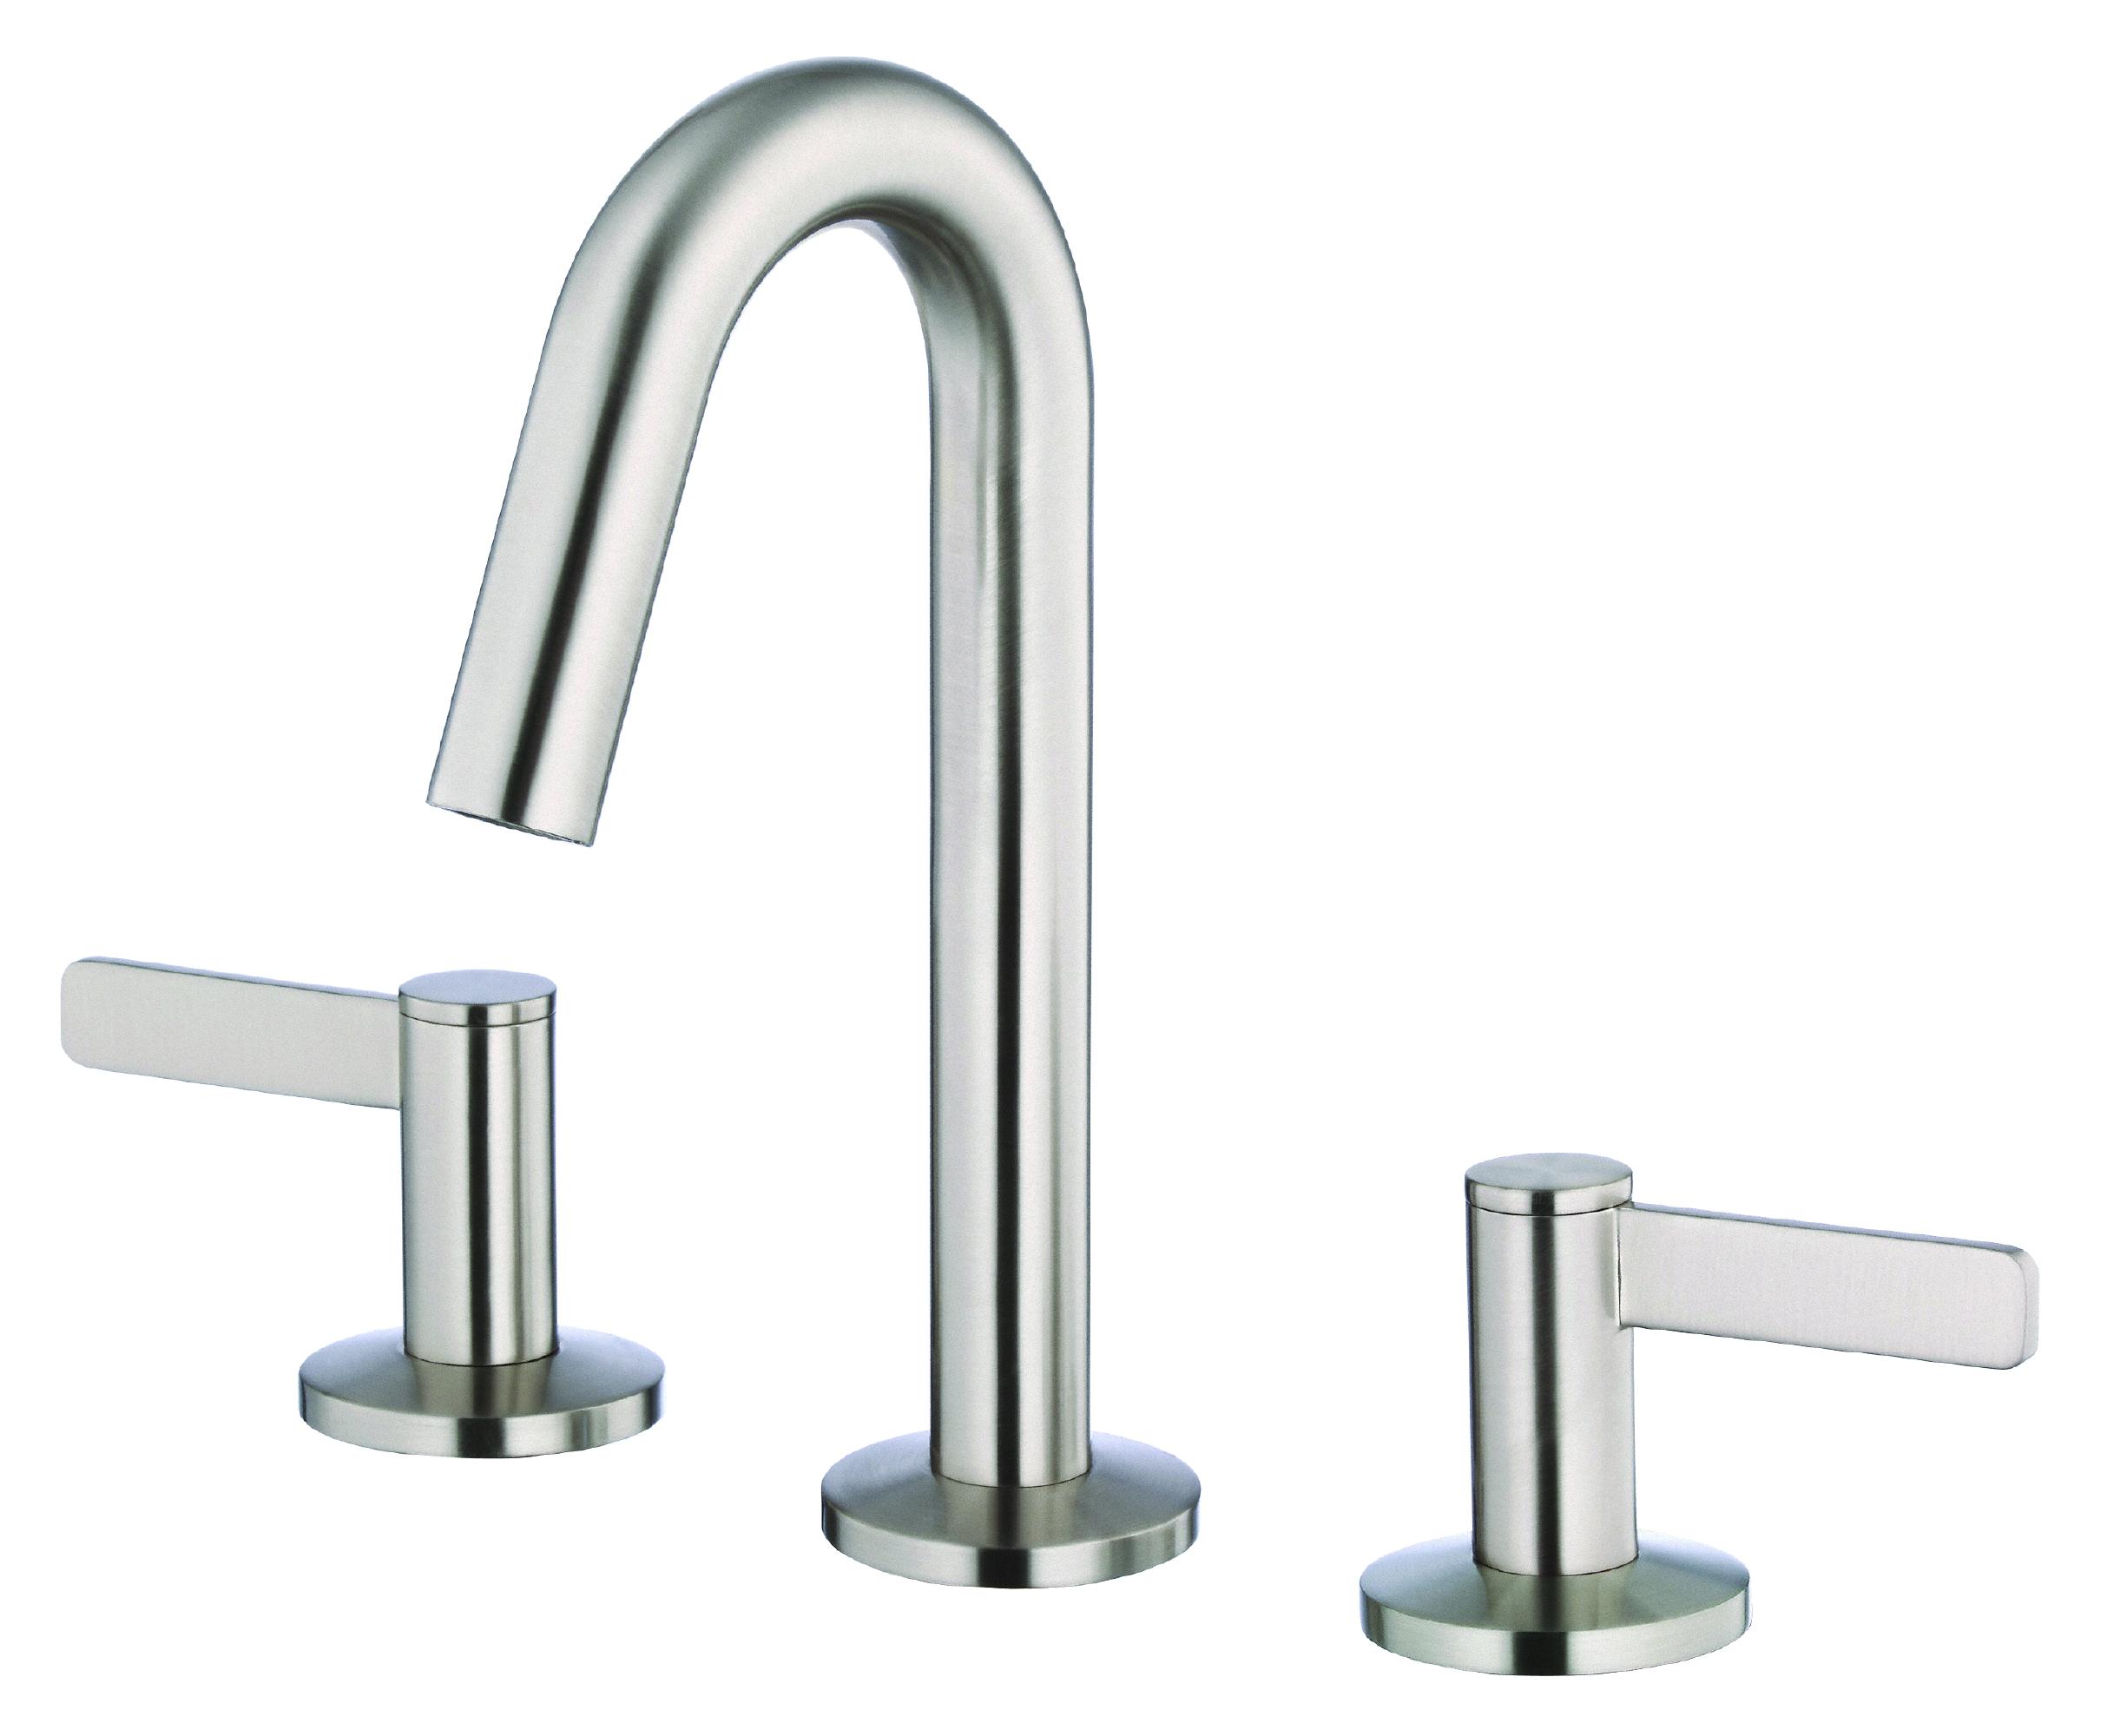 Danze Two Handle Mini-Widespread Lavatory Faucet